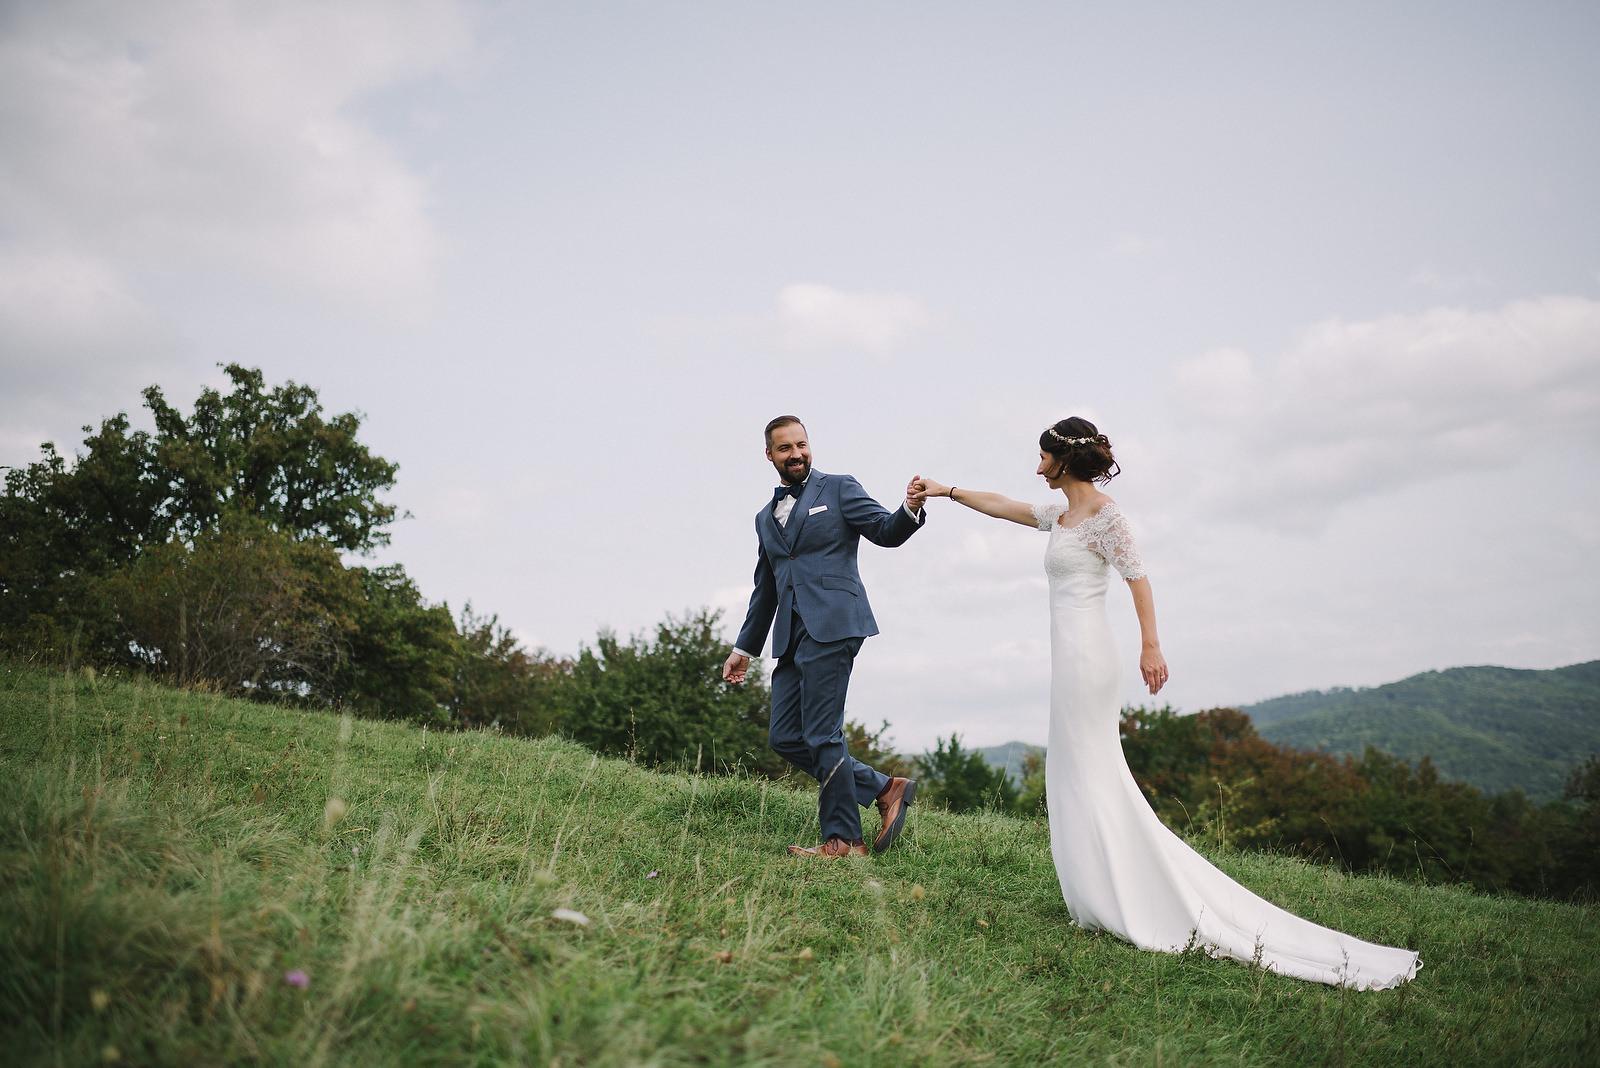 Fotograf Konstanz - Hochzeitsfotograf Reutlingen Achalm Hochzeit EFP 23 - Als Hochzeitsfotograf auf der Achalm, Reutlingen  - 17 -